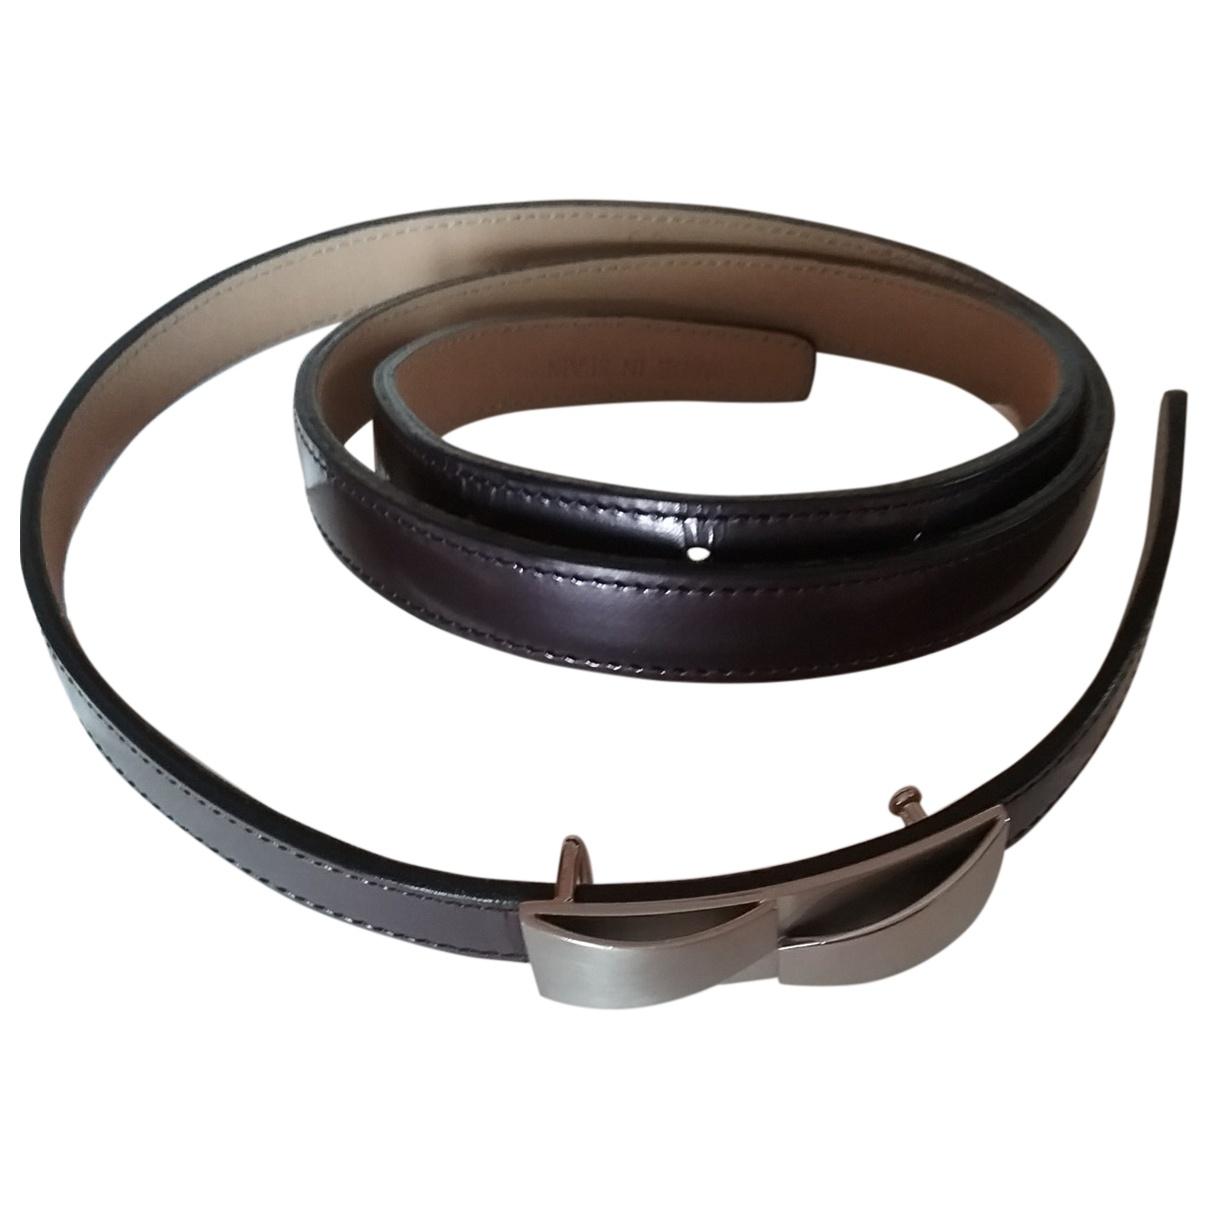 Loewe \N Leather belt for Women 85 cm